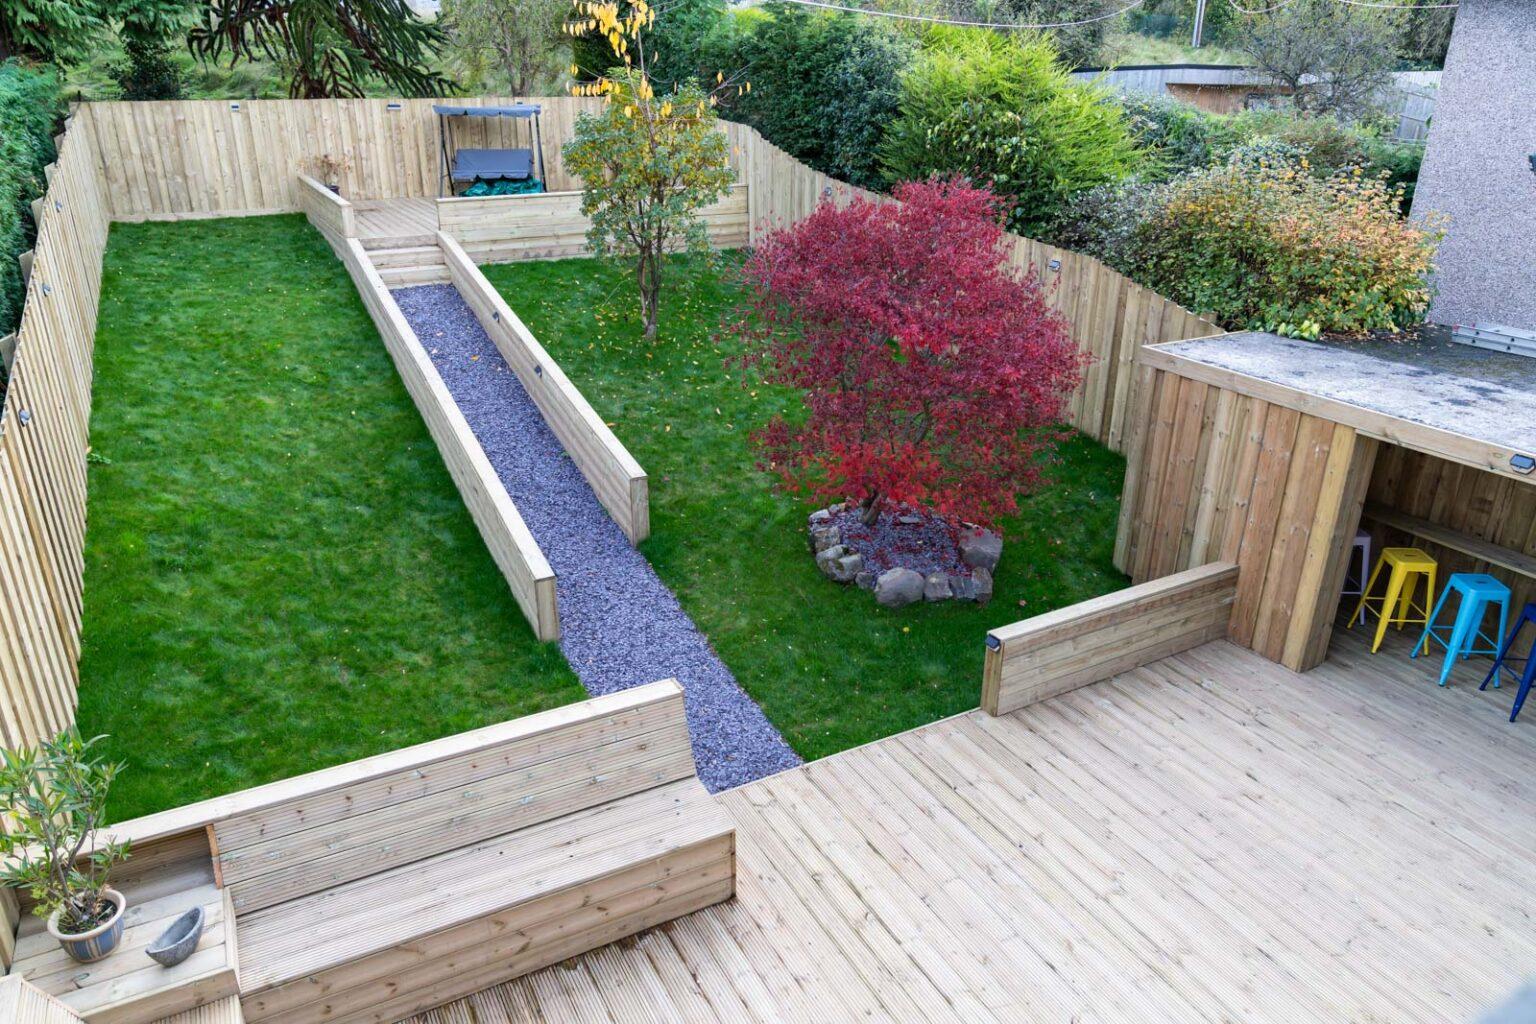 Landscaped Garden & Entertaining Area